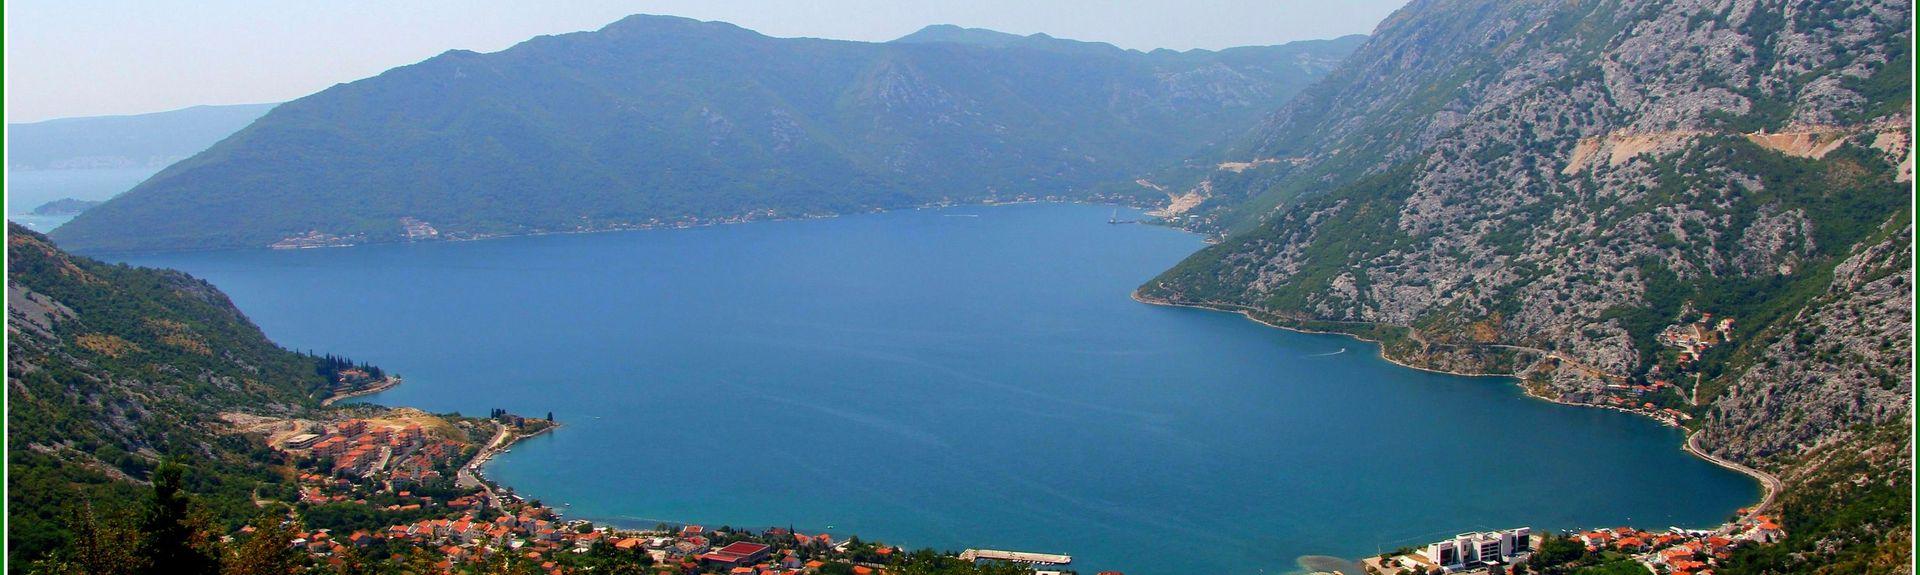 Risan, Kotor Municipality, Montenegro